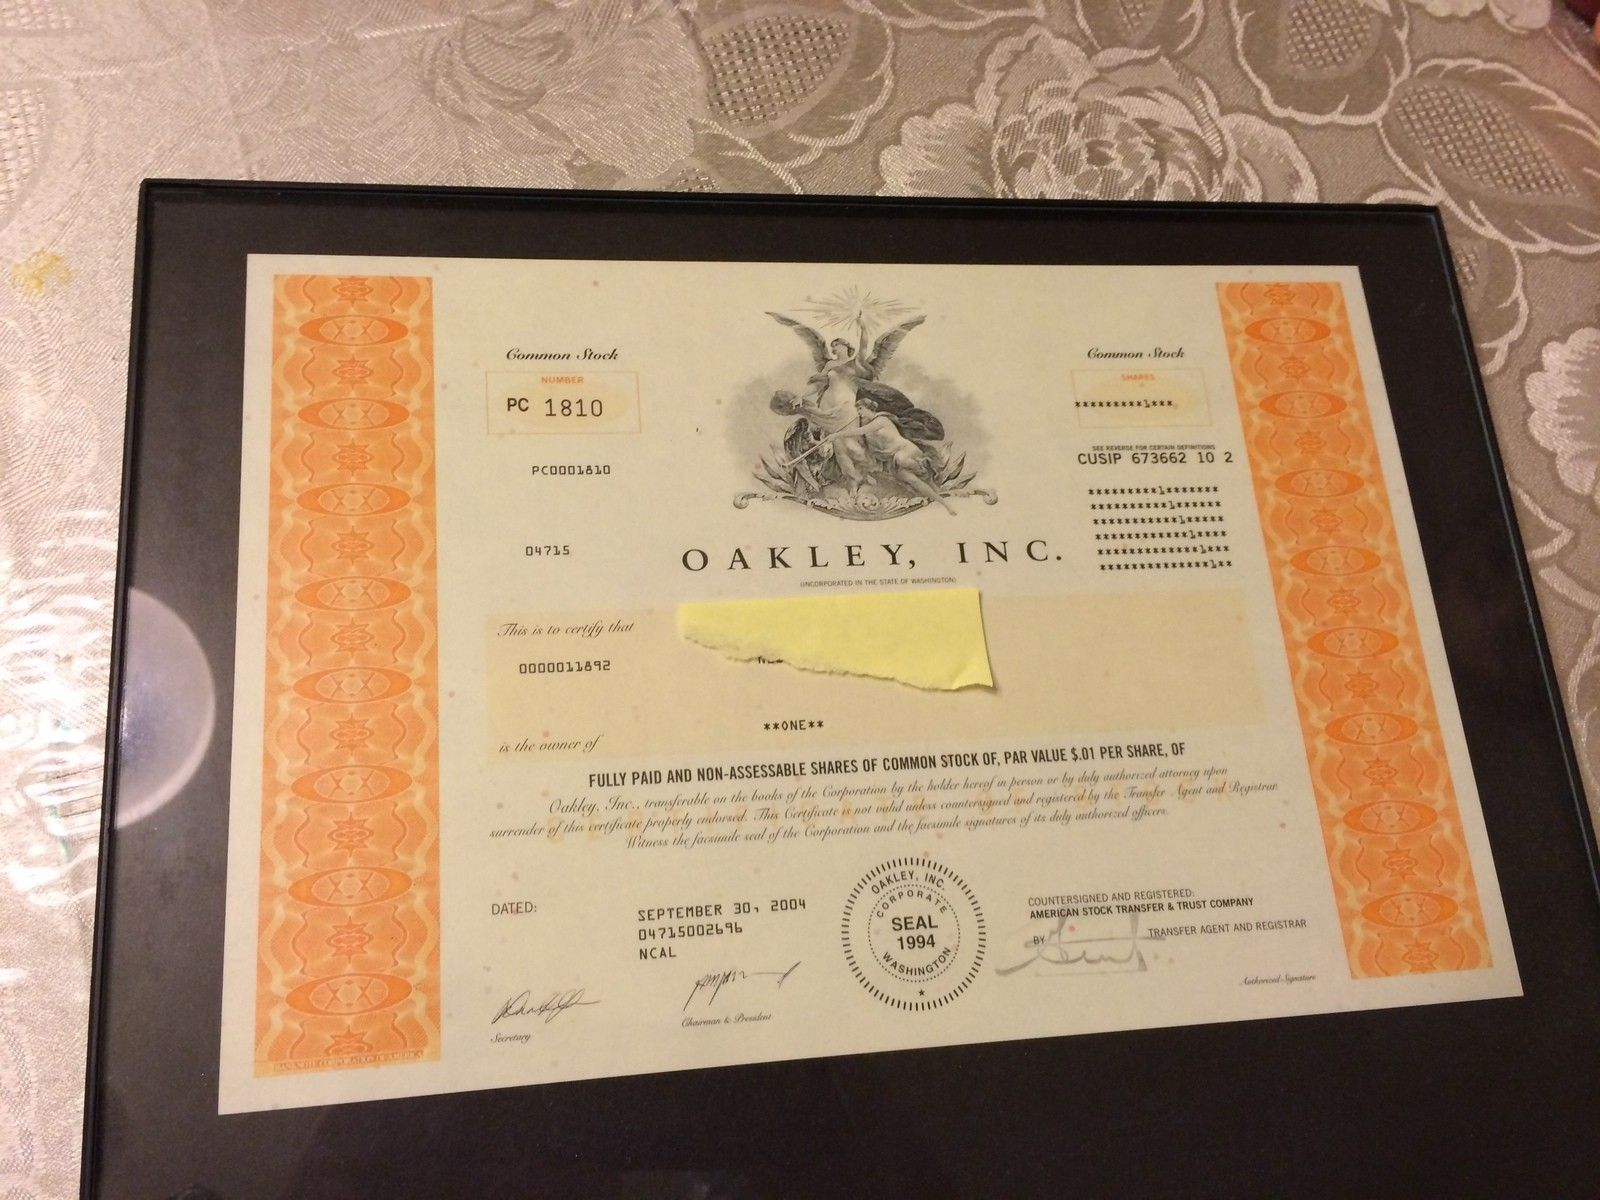 Authentic Oakley Inc Stock Certificate - photo.JPG